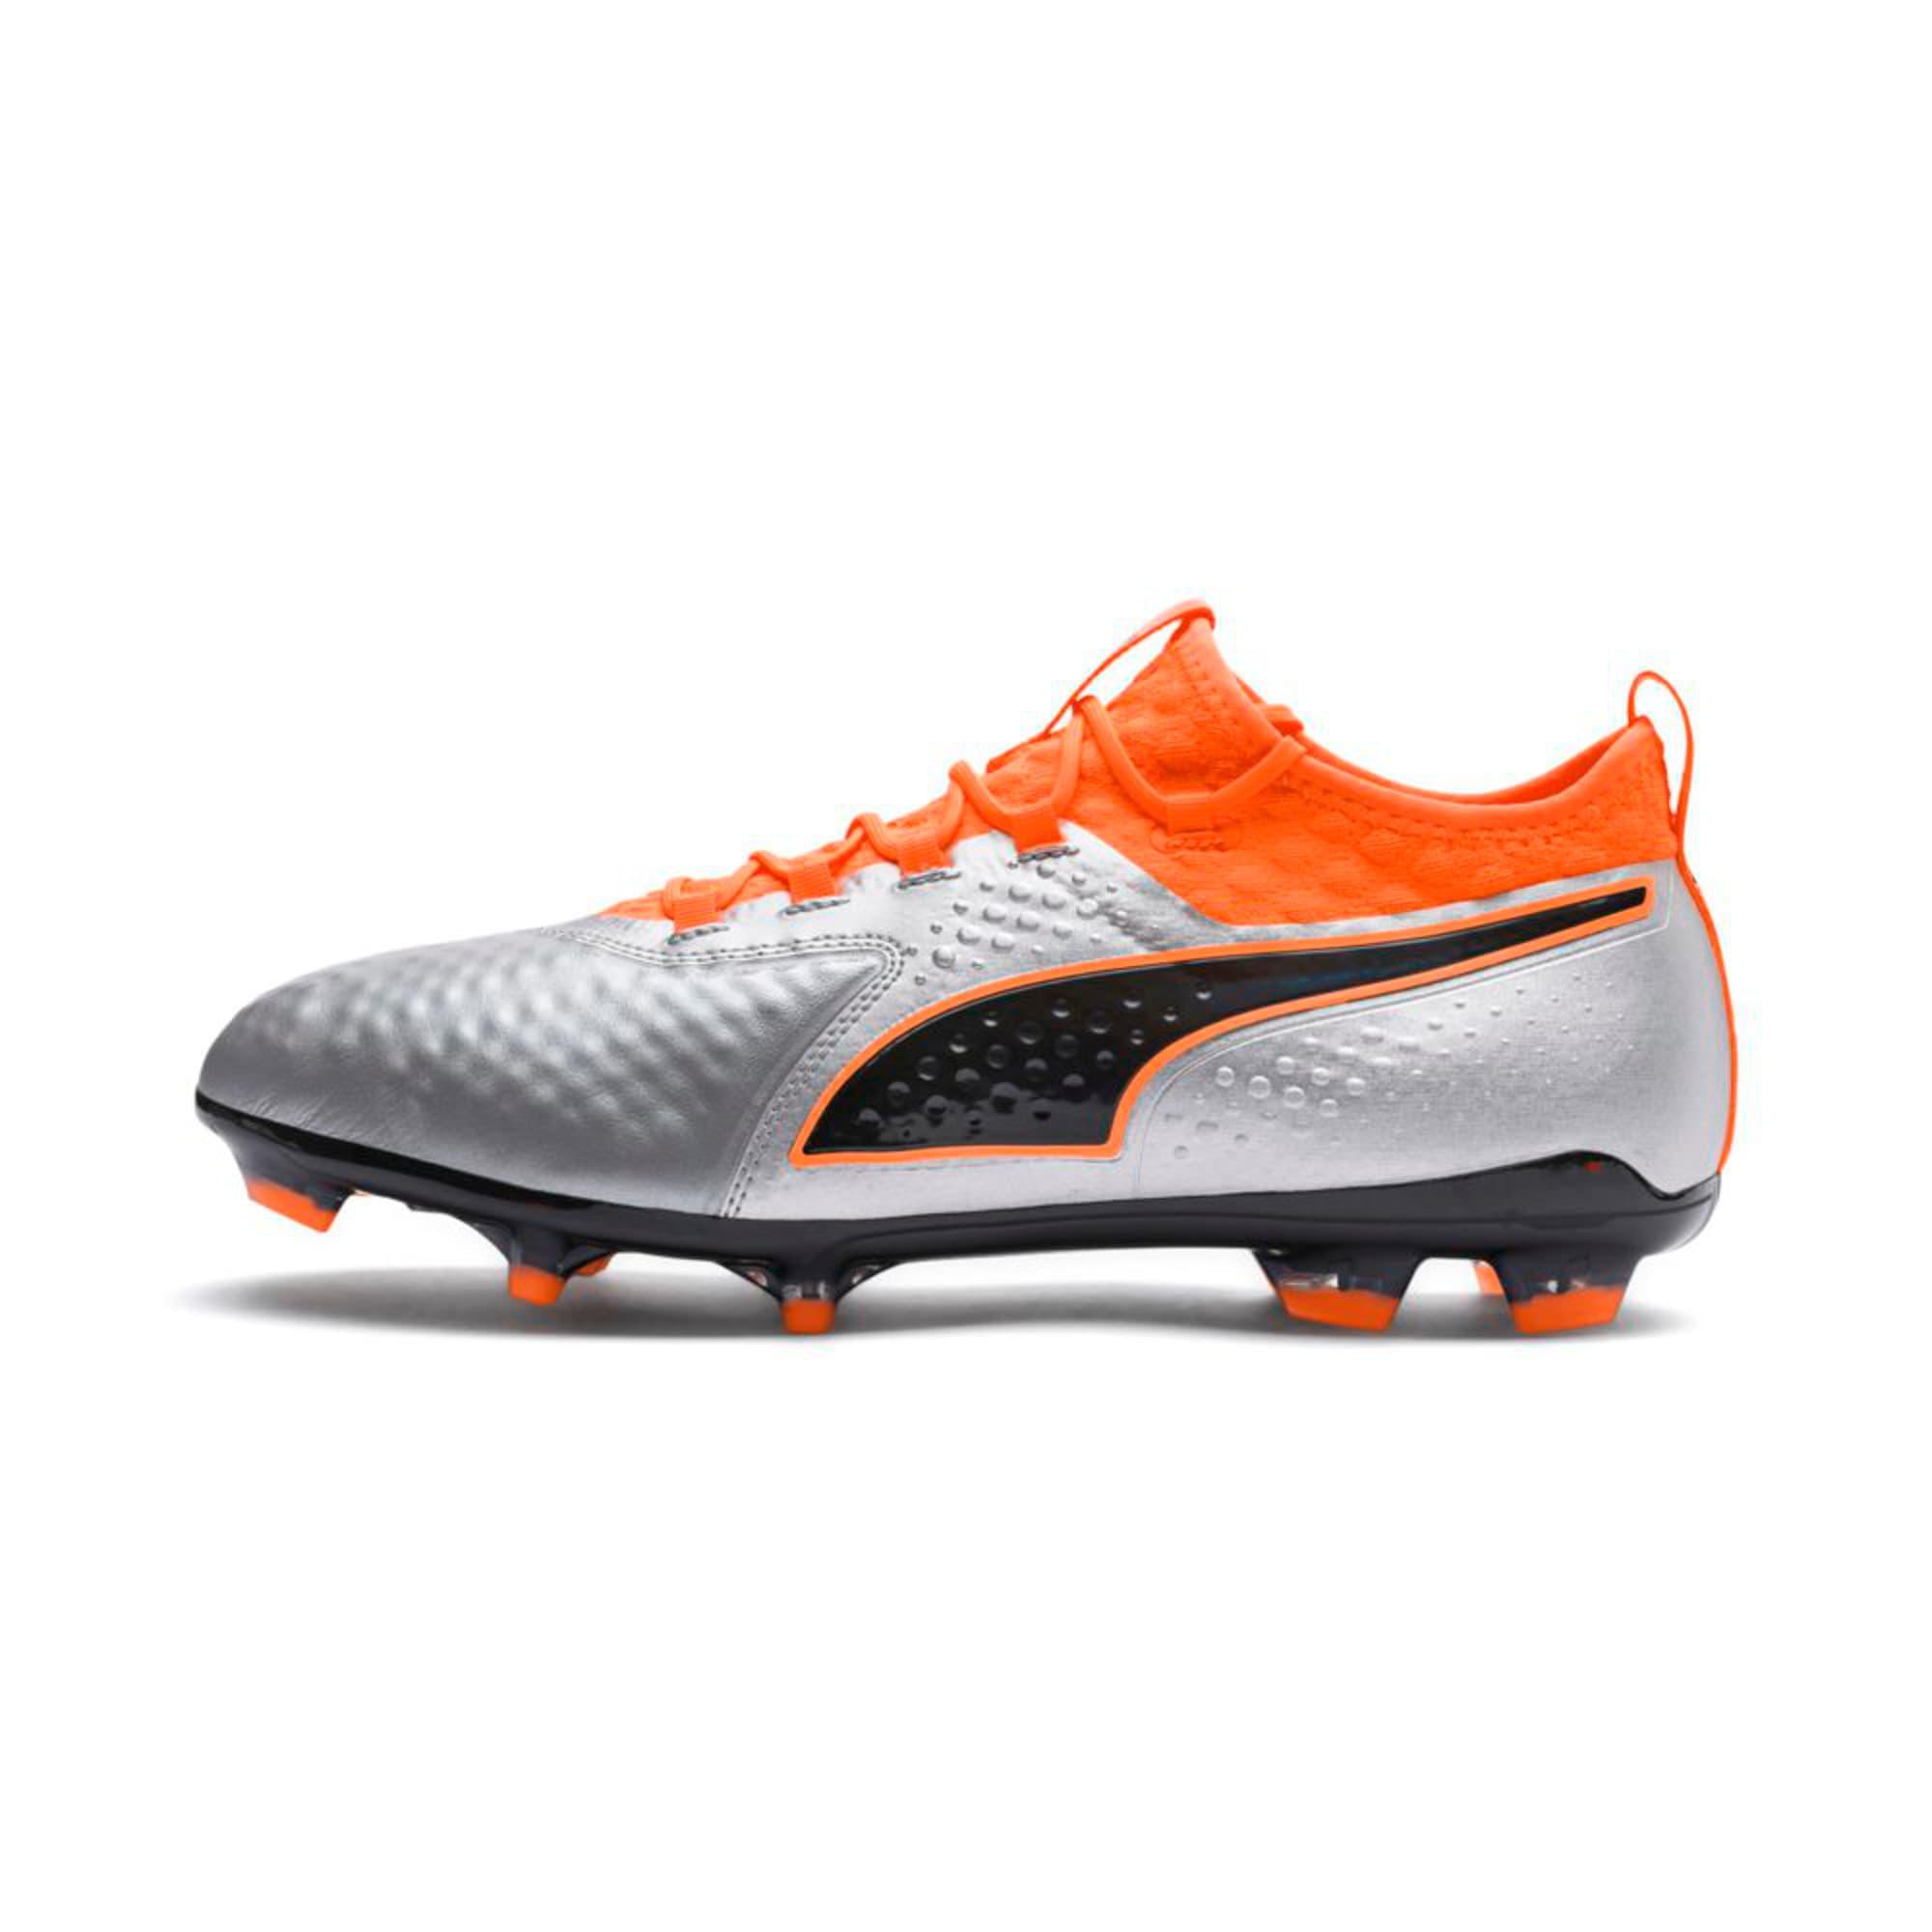 Thumbnail 1 of PUMA ONE 2 Leather FG  Football Boots, Silver-Orange-Black, medium-IND